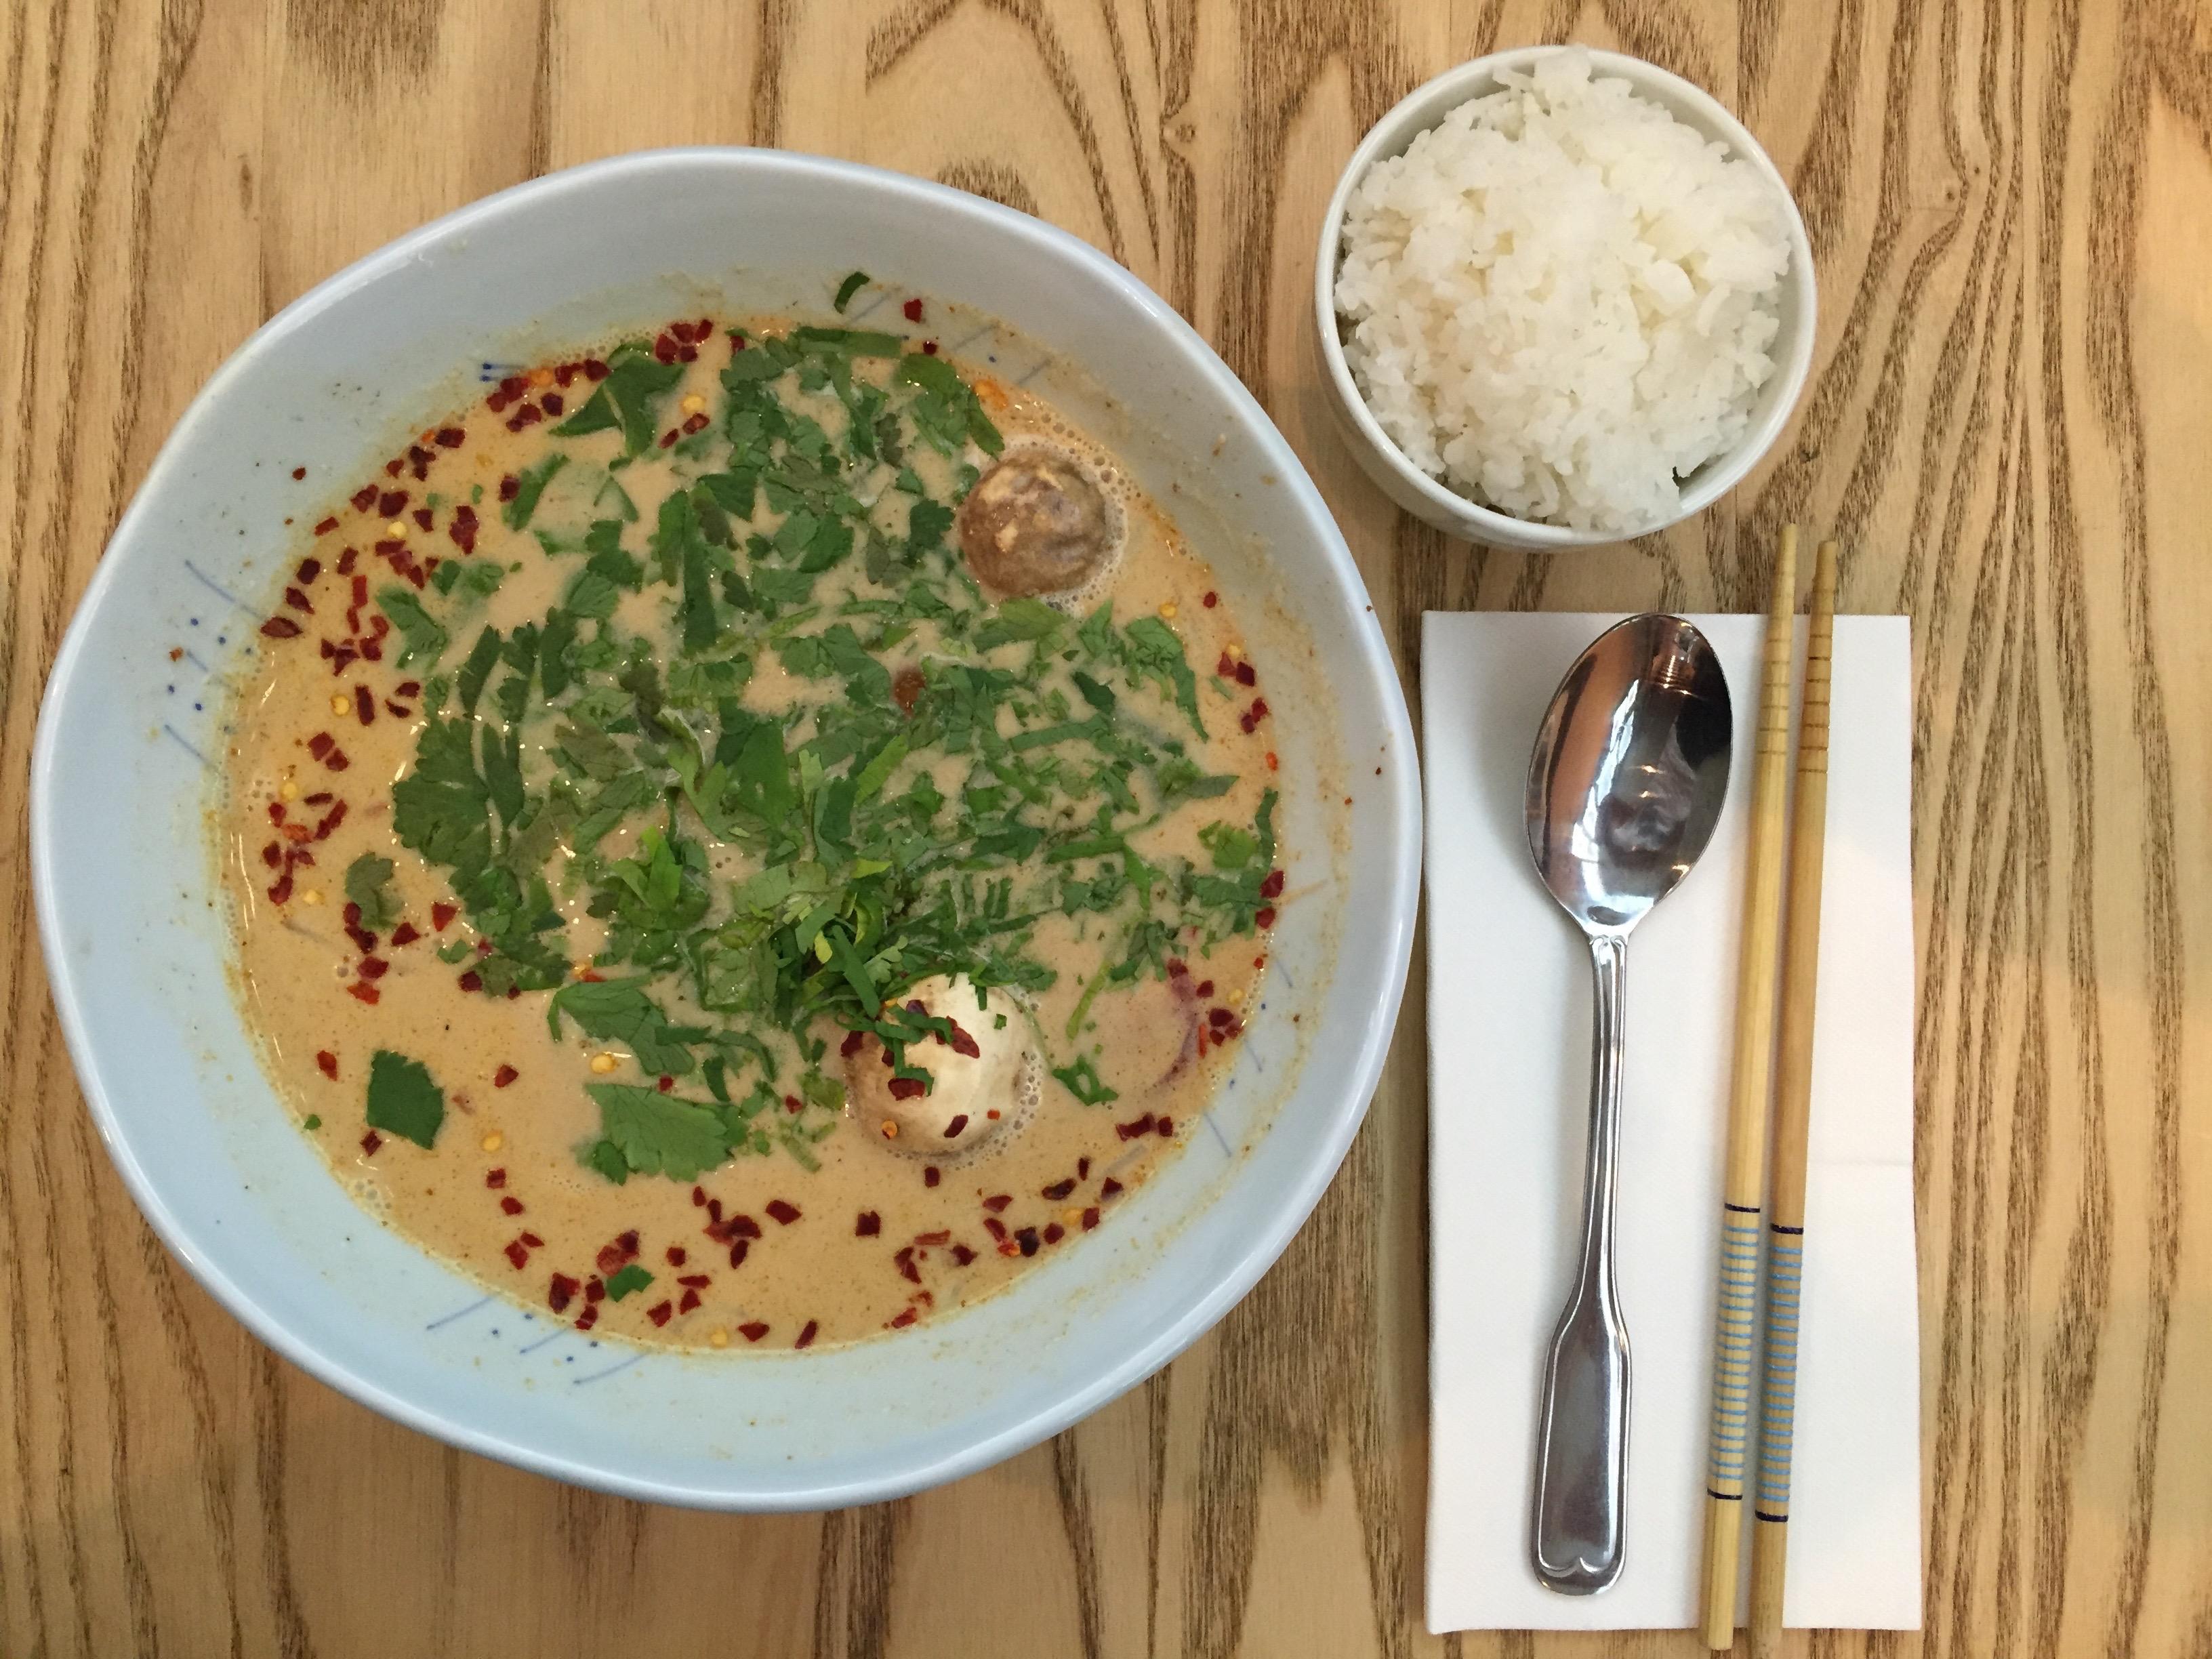 East суп